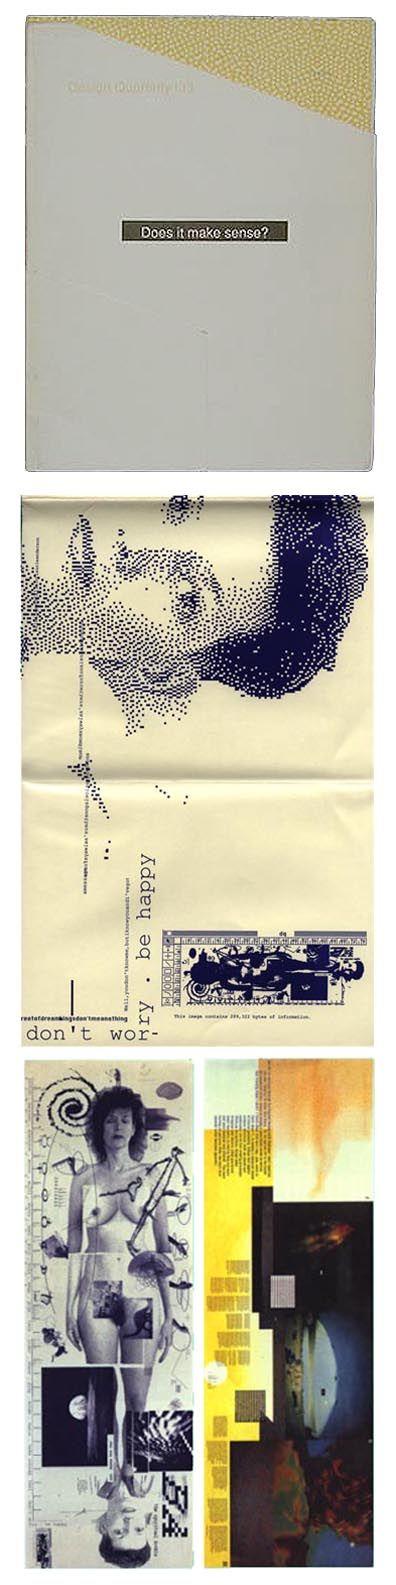 kingy graphic design history: April Greiman - Judy